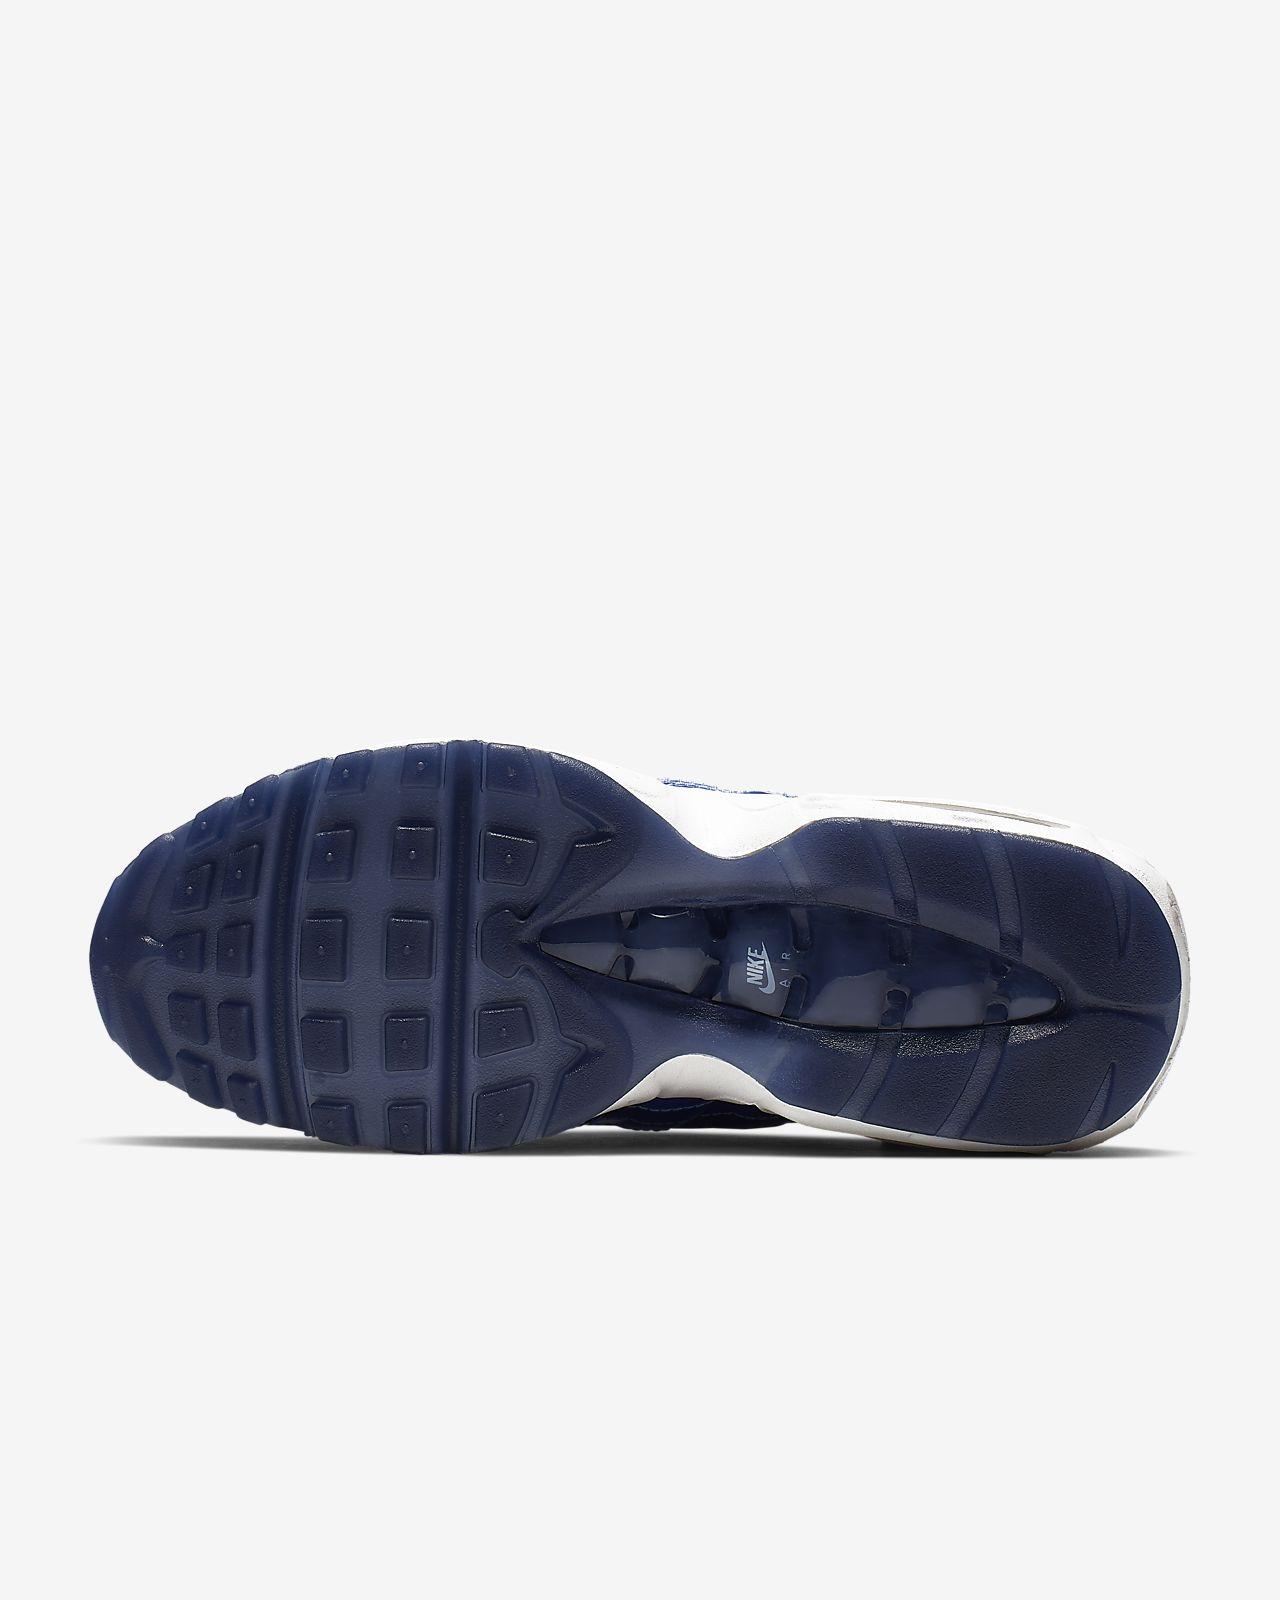 59d2d3c1d00fd5 Nike Air Max 95 SE Women s Shoe. Nike.com AT